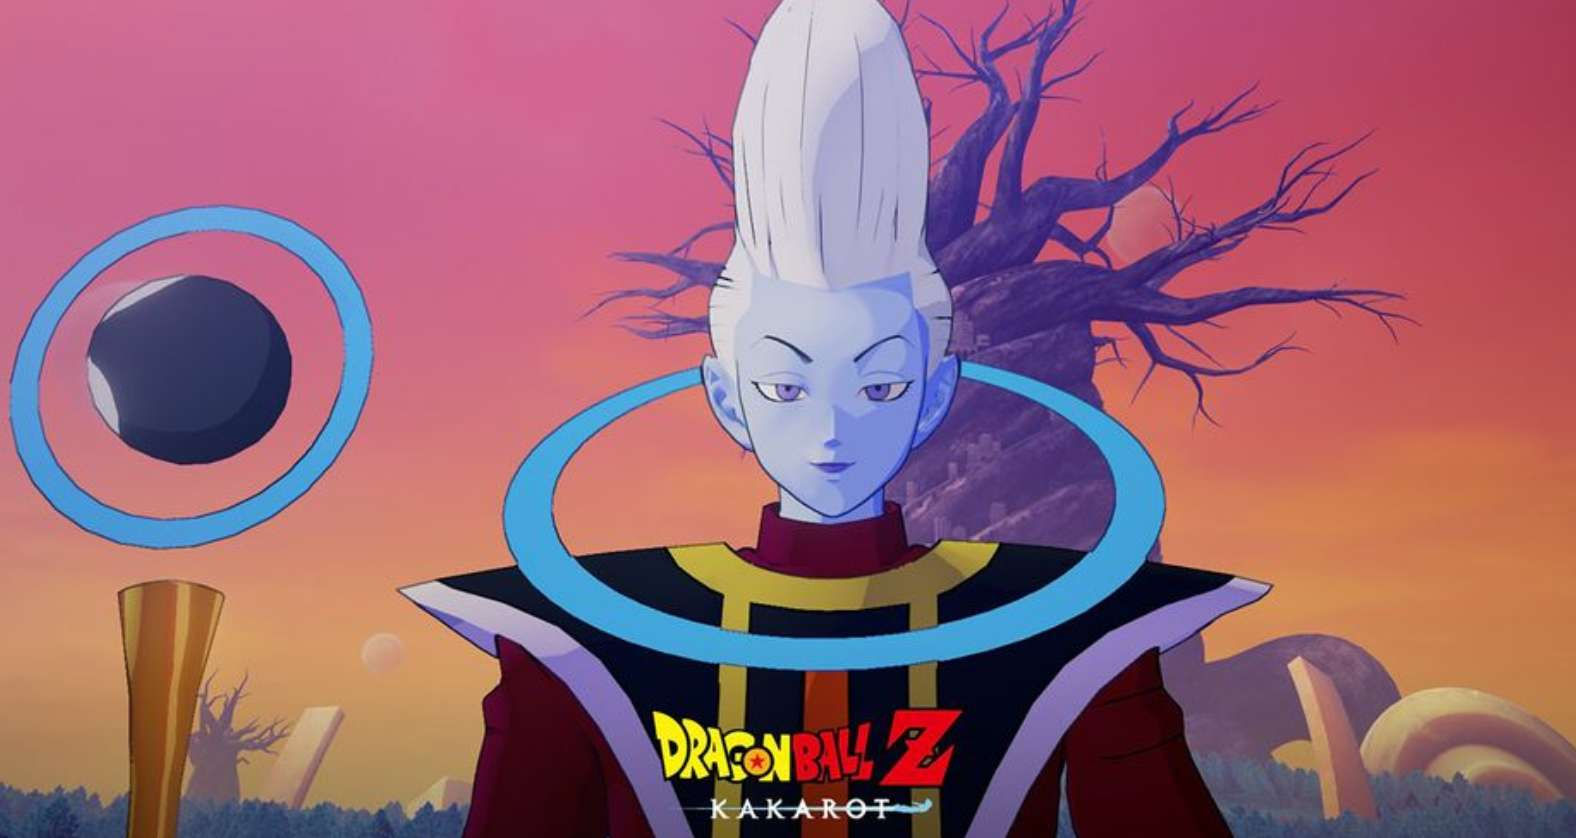 Dragon Ball Z: Kakarot Releases DLC Screen Shots Showing Off Whis, Beerus, And Super Saiyan God Goku And Vegeta